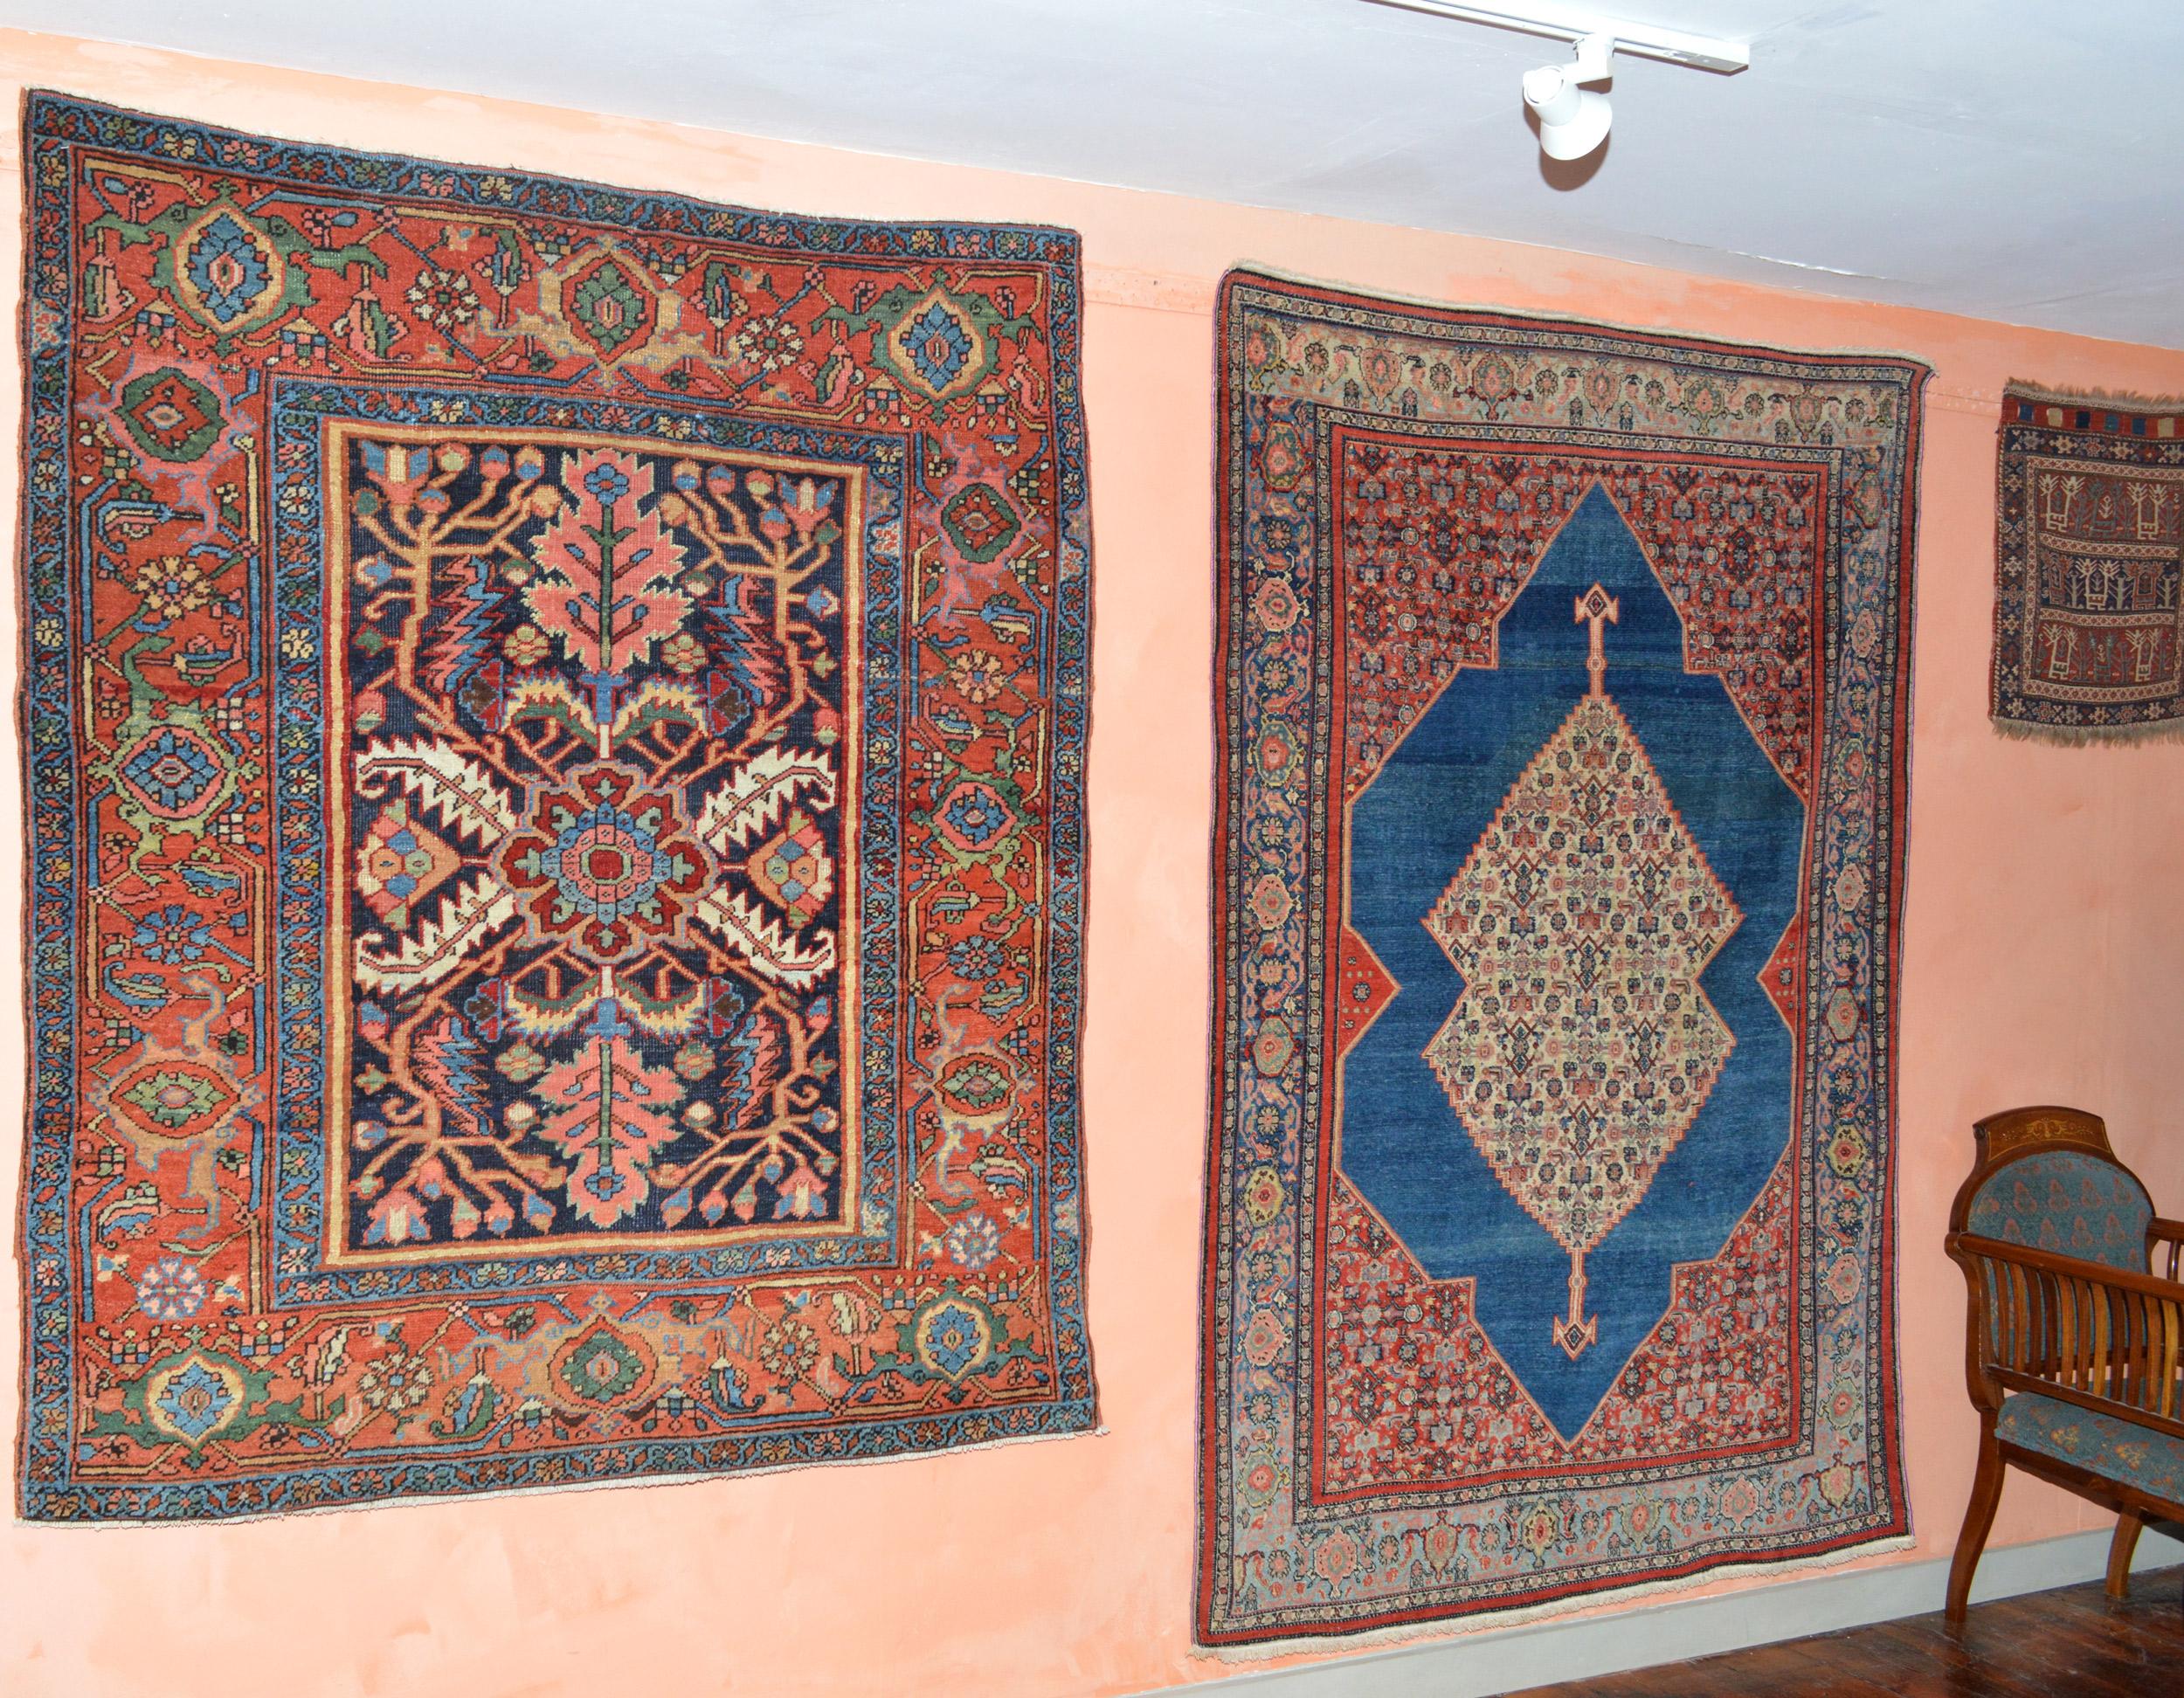 Douglas Stock Gallery, Antique Oriental Rugs, South Natick (Boston area), Massachusetts